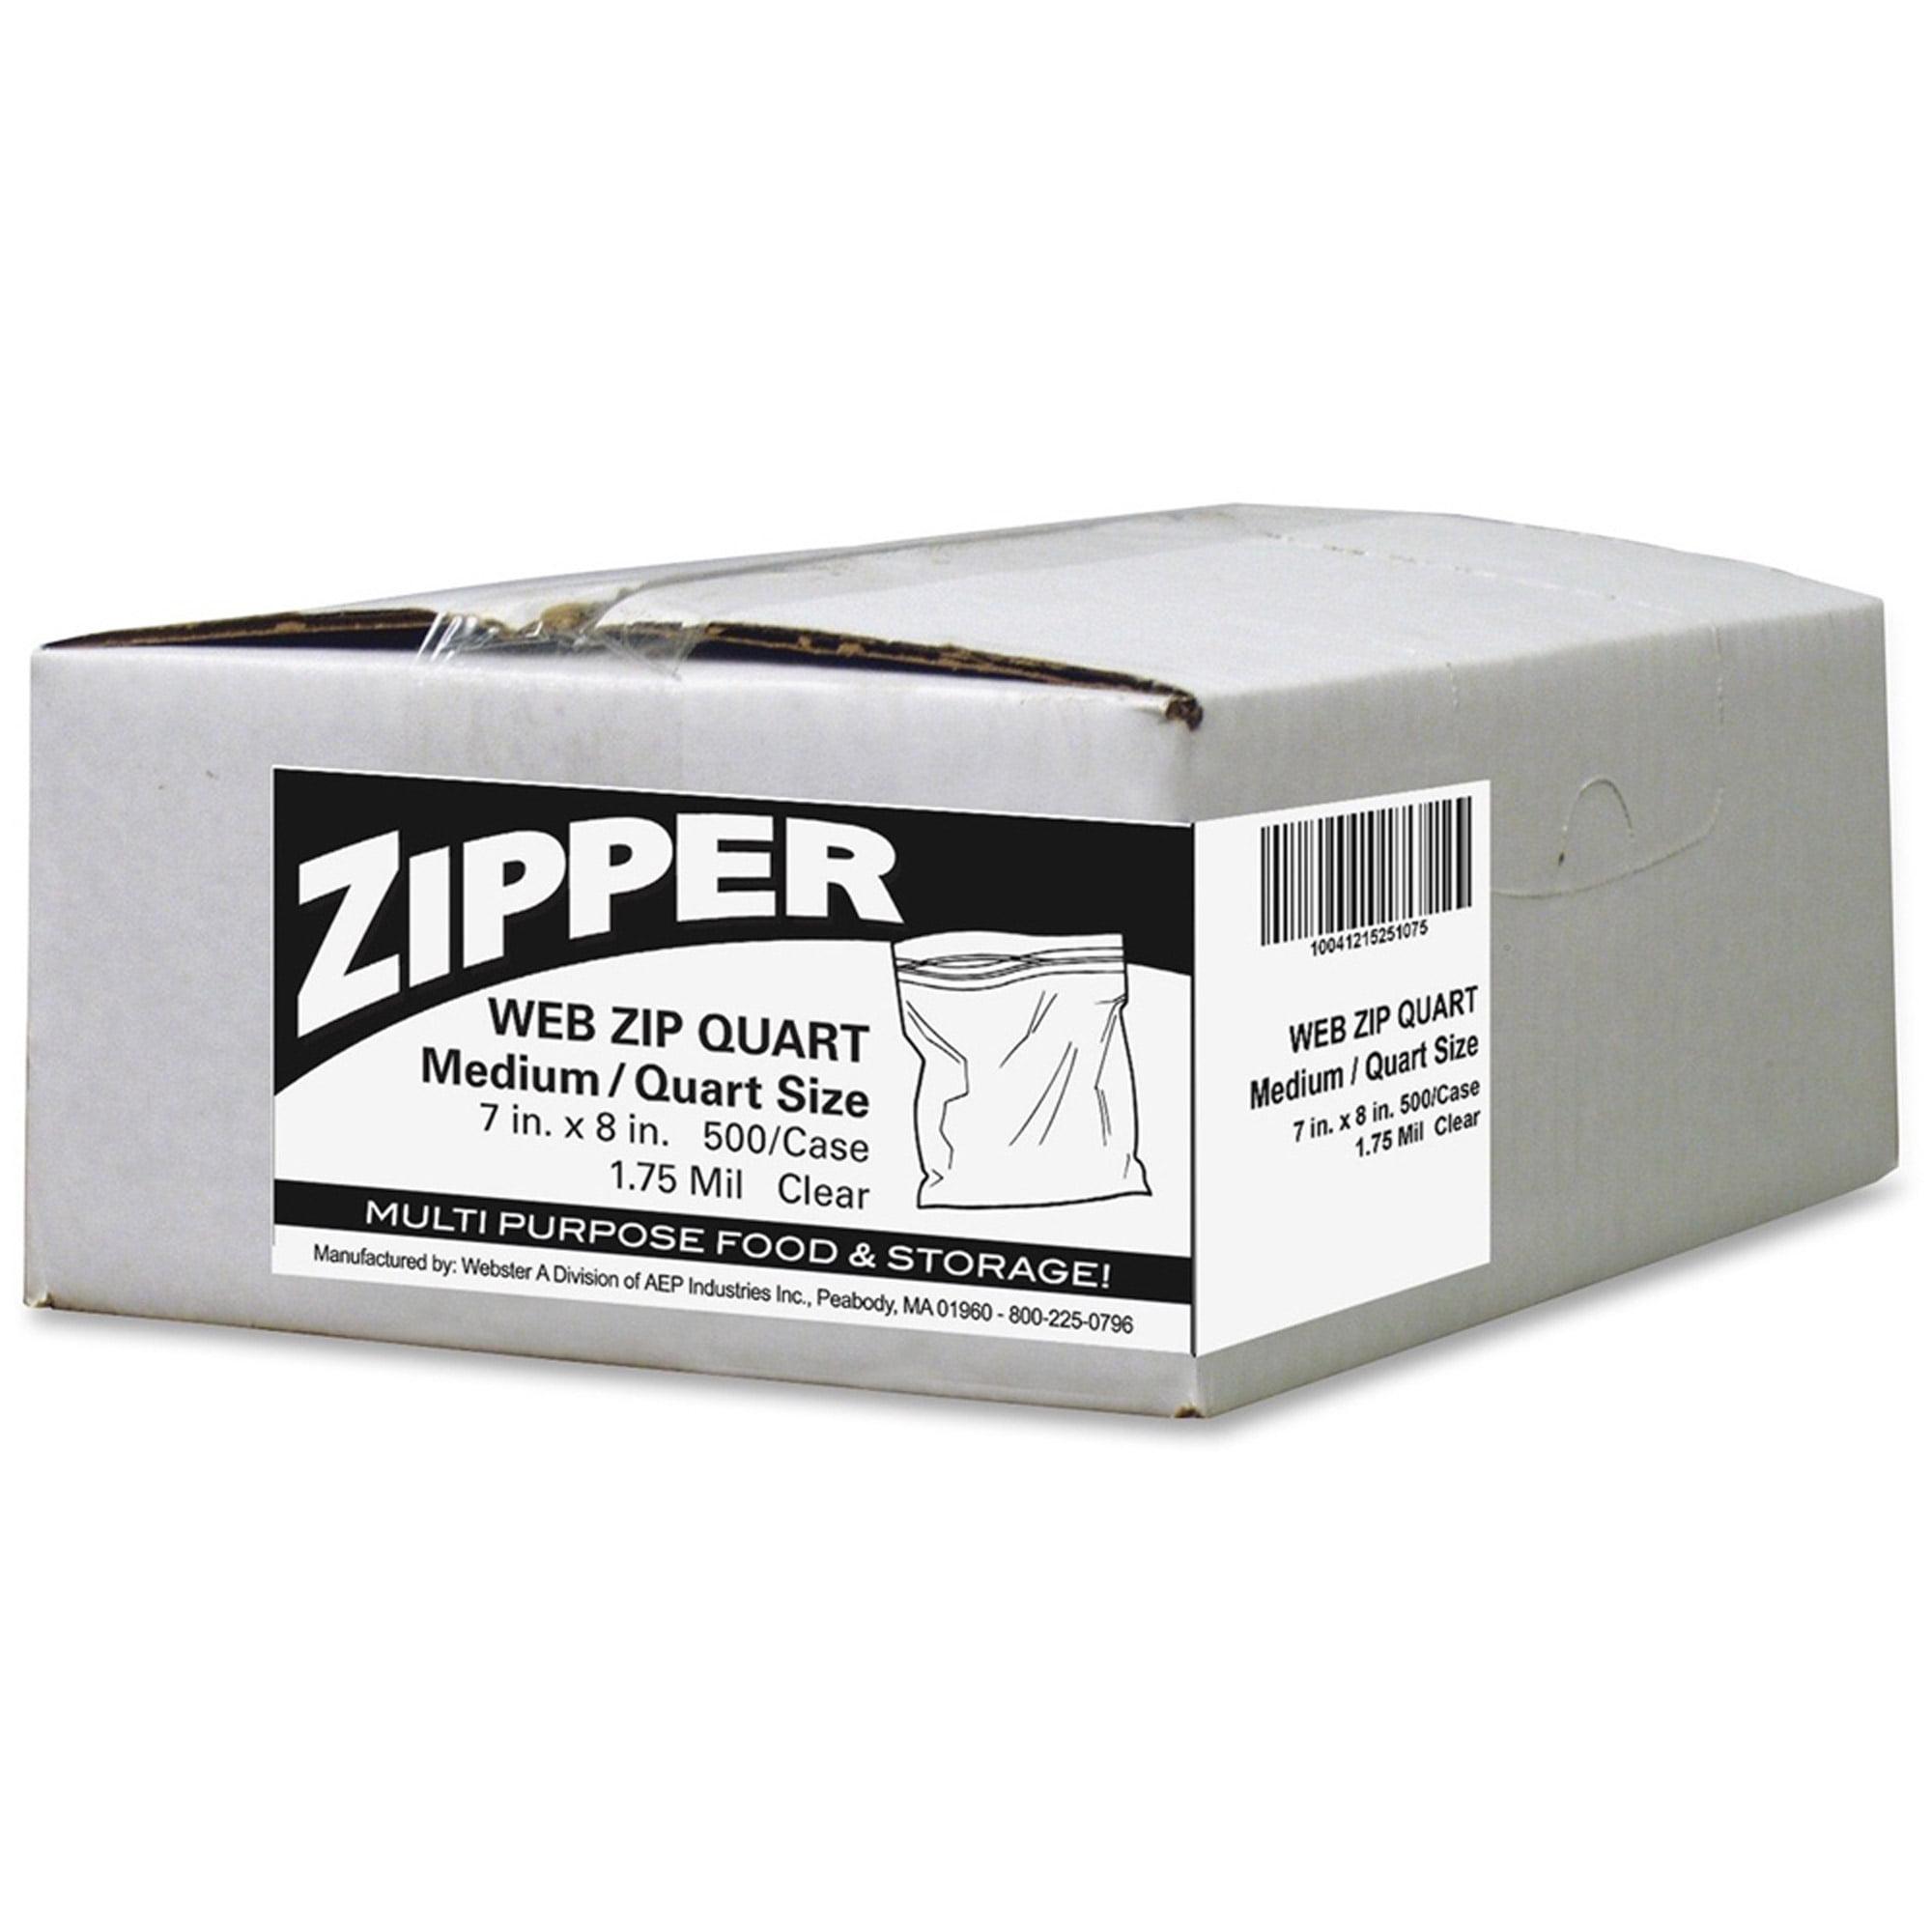 Webster Zipper Quart Size Storage Bags, 500 count